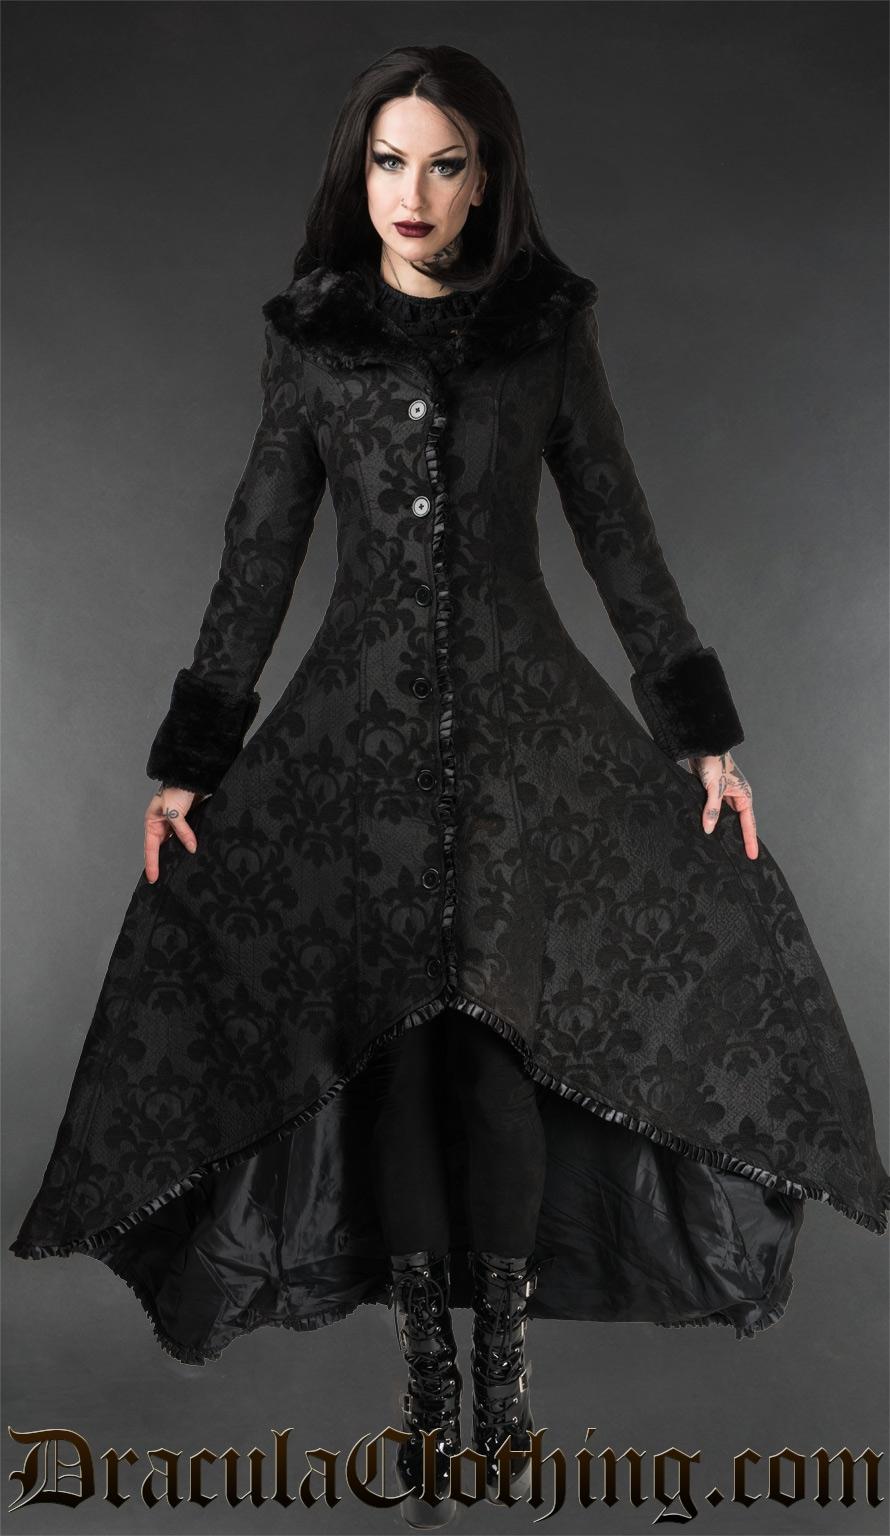 Skull Brocade Evil Princess Coat